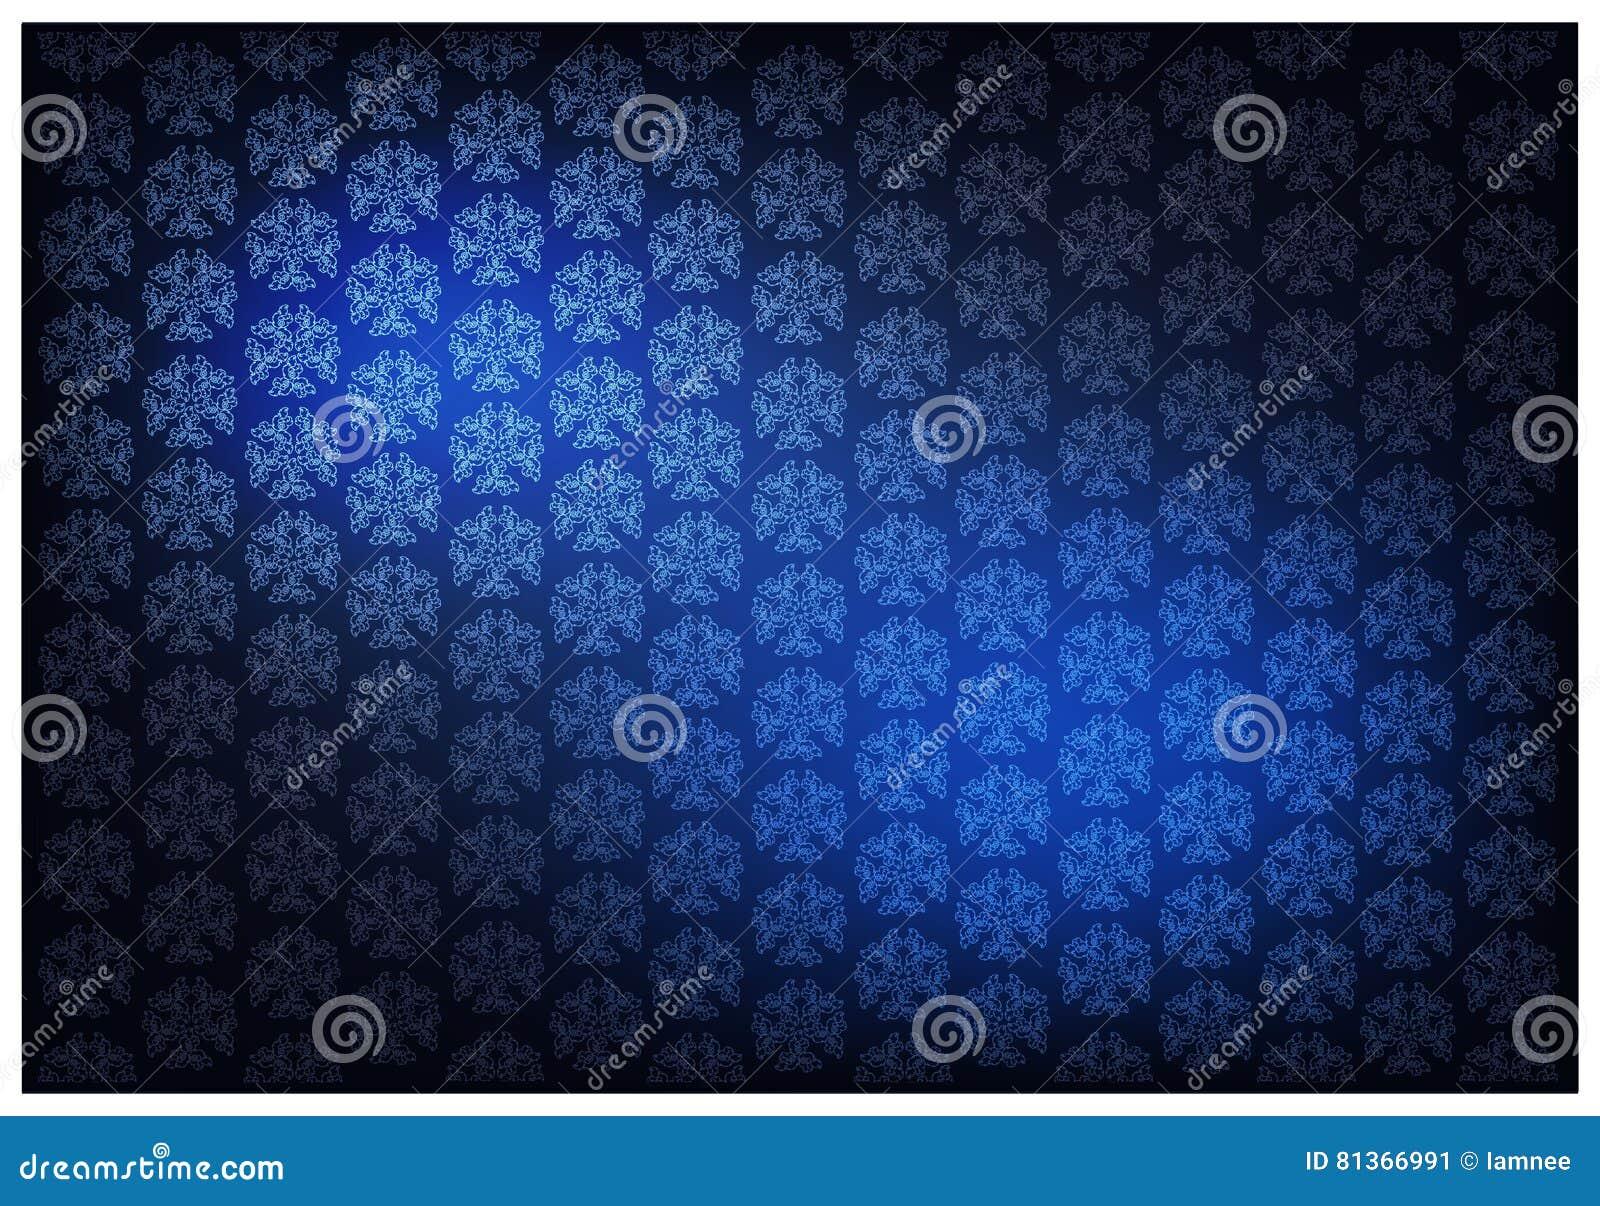 Blue Color Of Thai Vintage Wallpaper Pattern Background